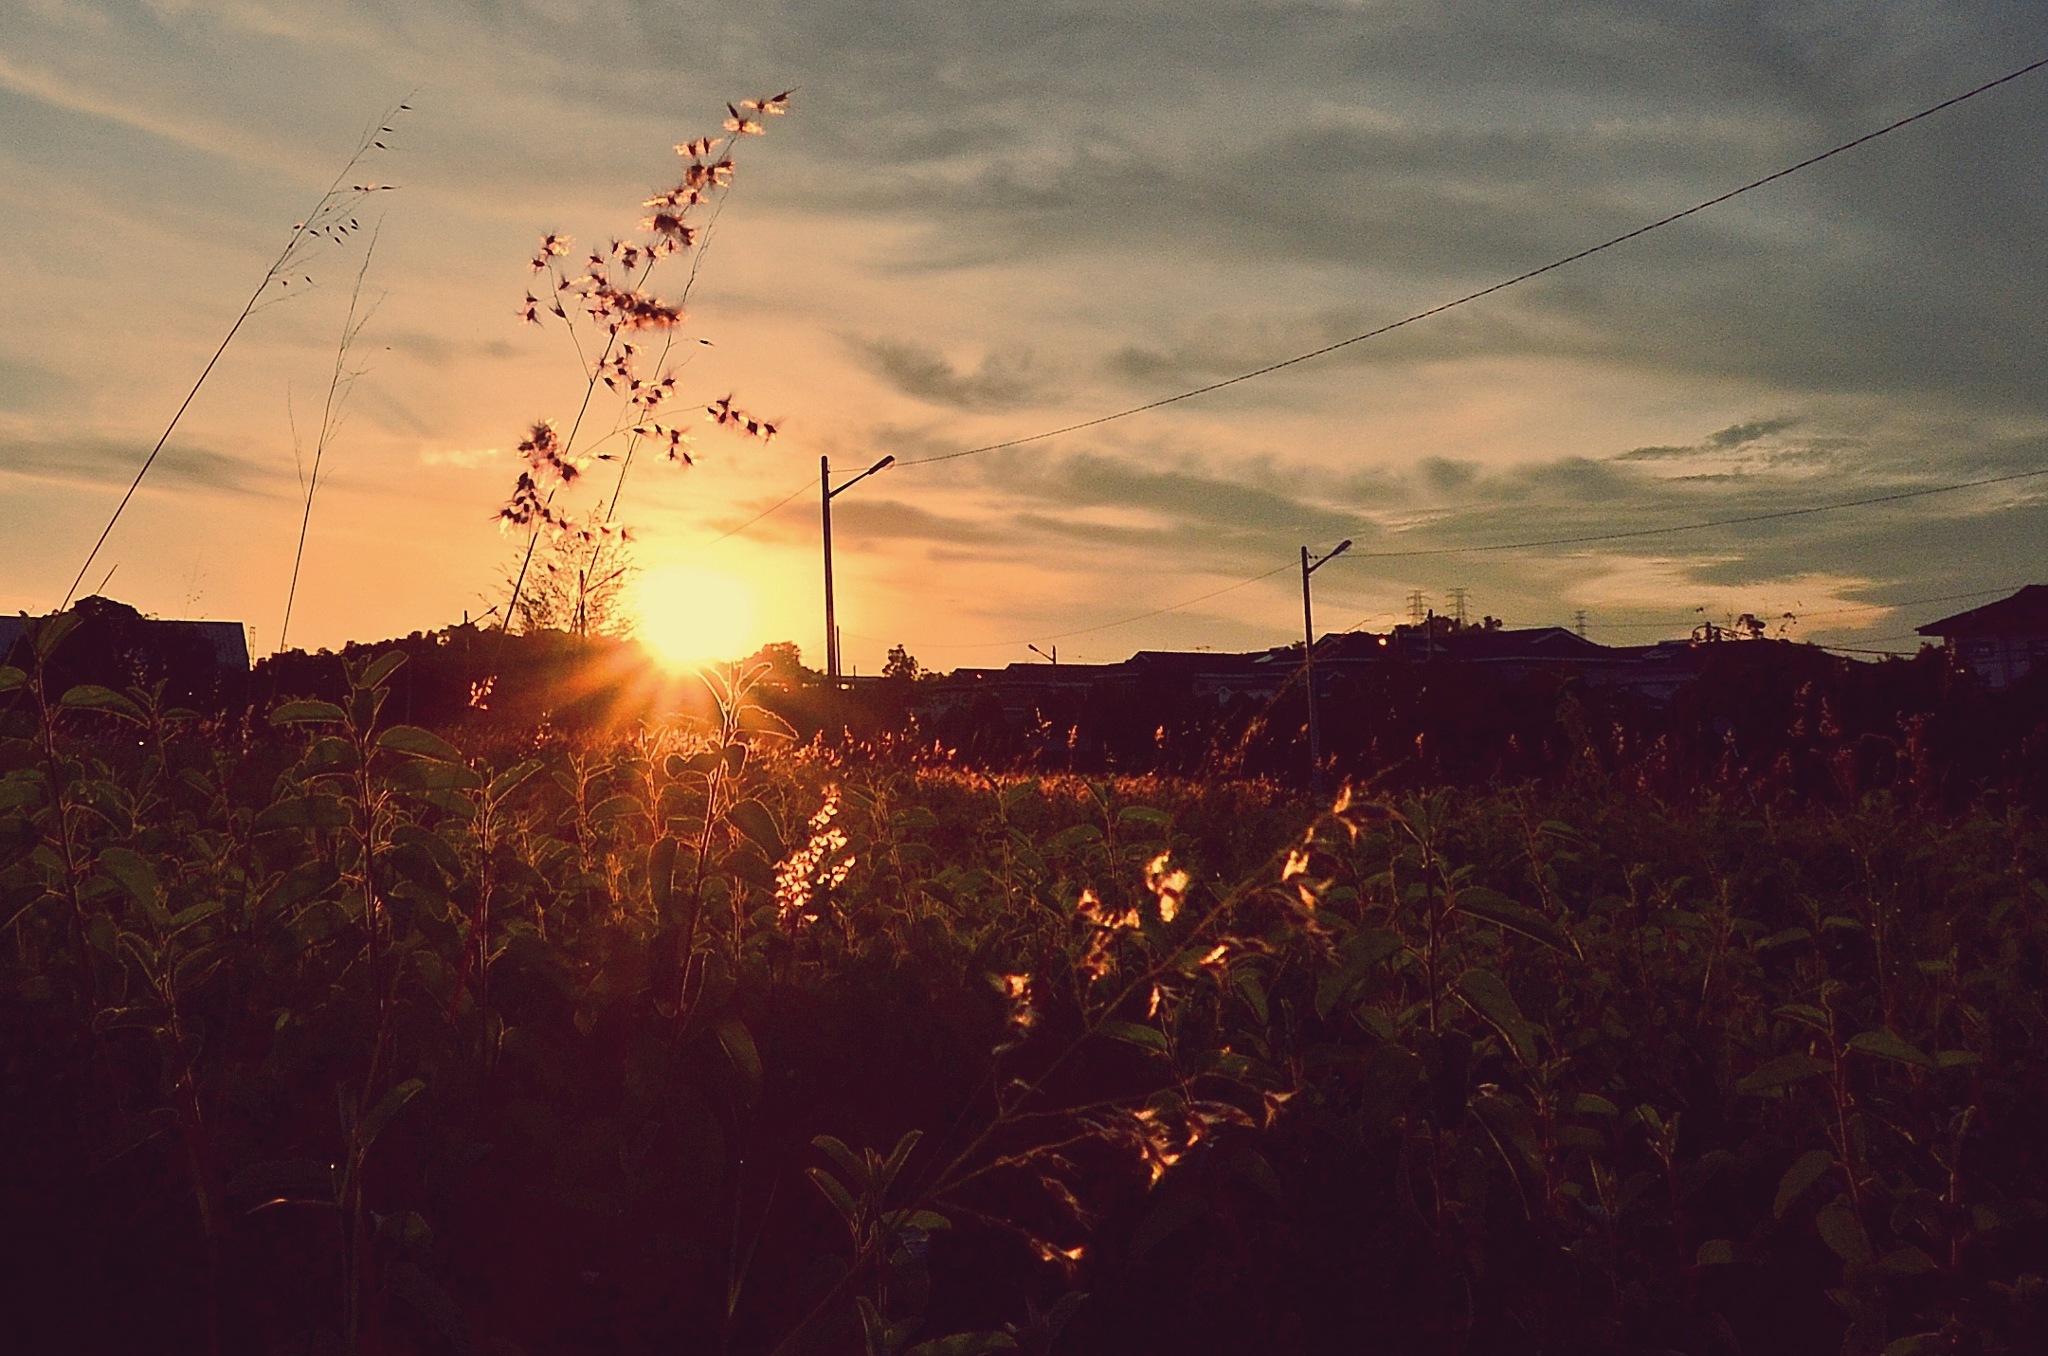 Sunrise by FarizMahmood